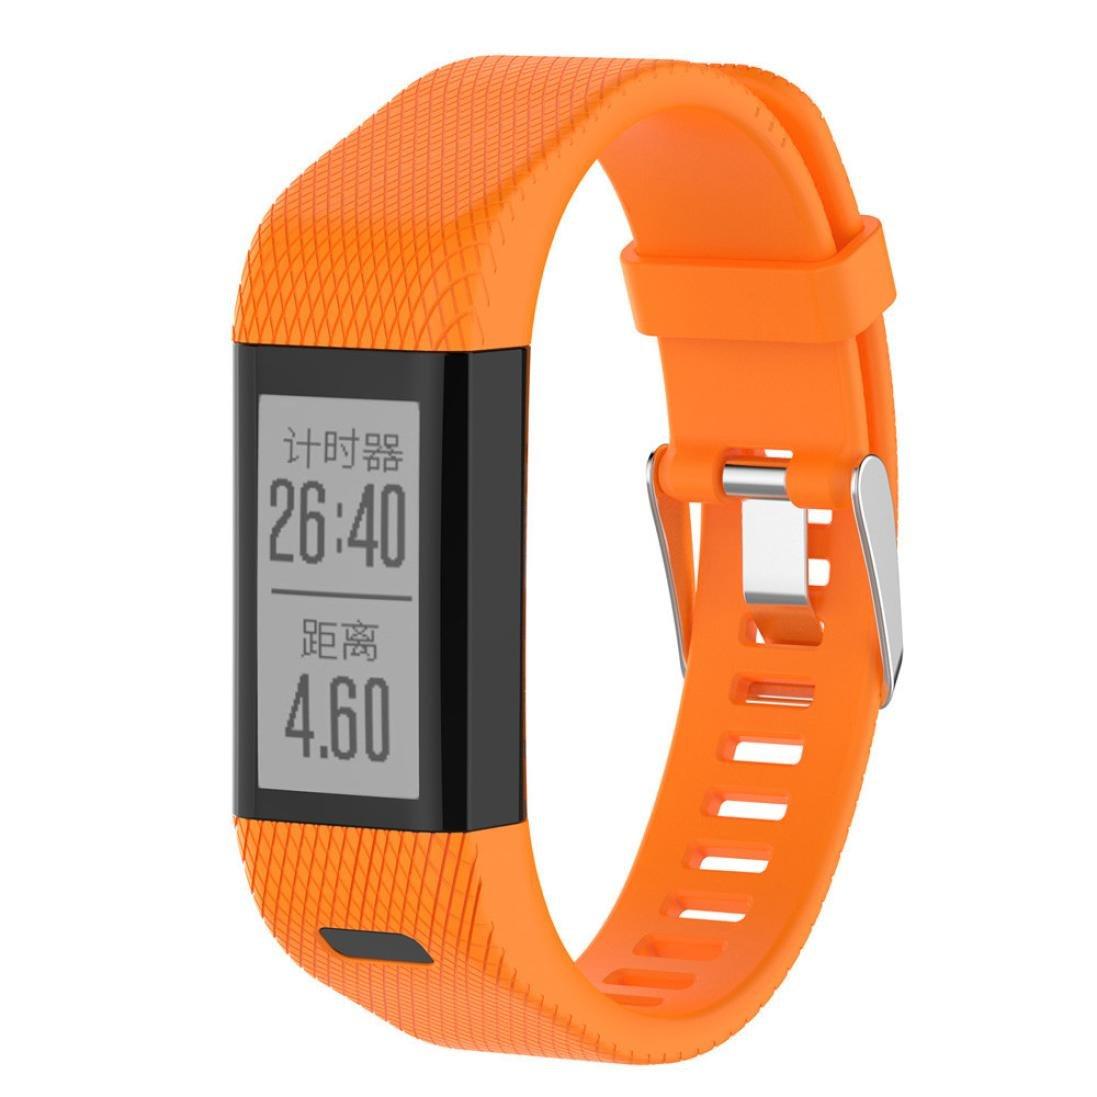 SamLike Replacement Band Strap Silicone Wrist Band Bracelet for Garmin Vivosmart HR +